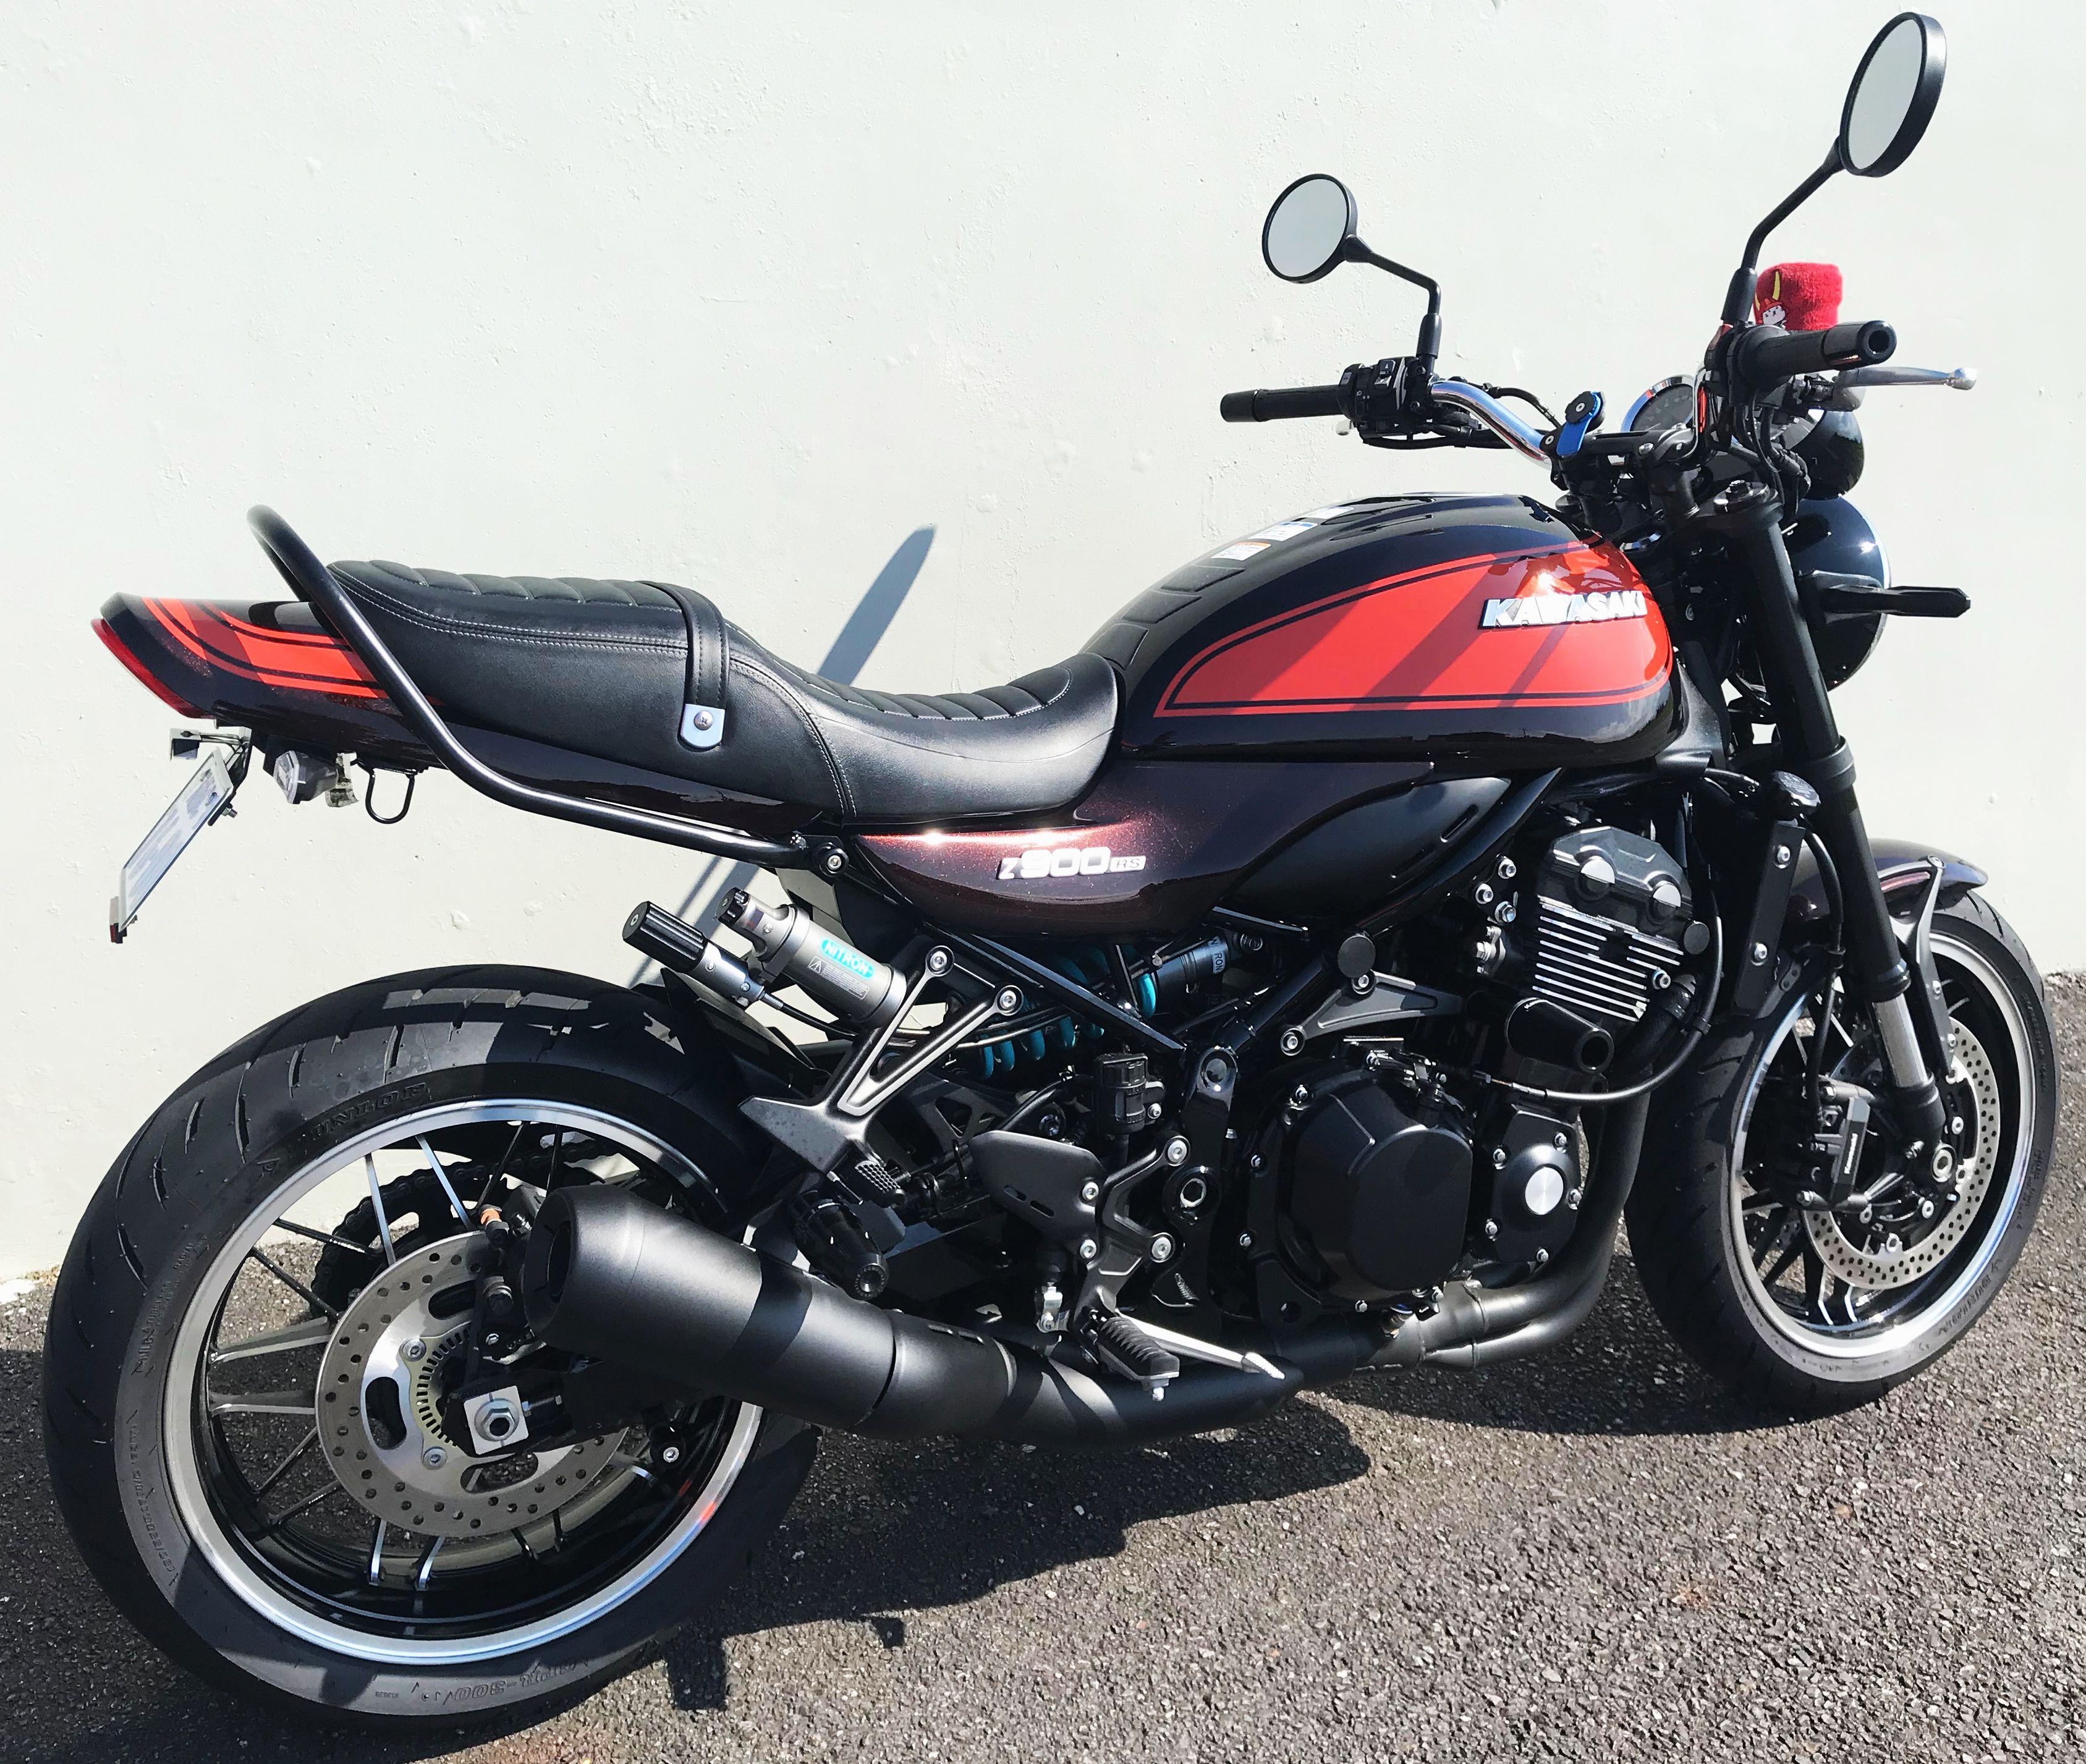 Z900 Rs Black Coat Muffler Exhaust バイク 車の塗装 カスタムバイク